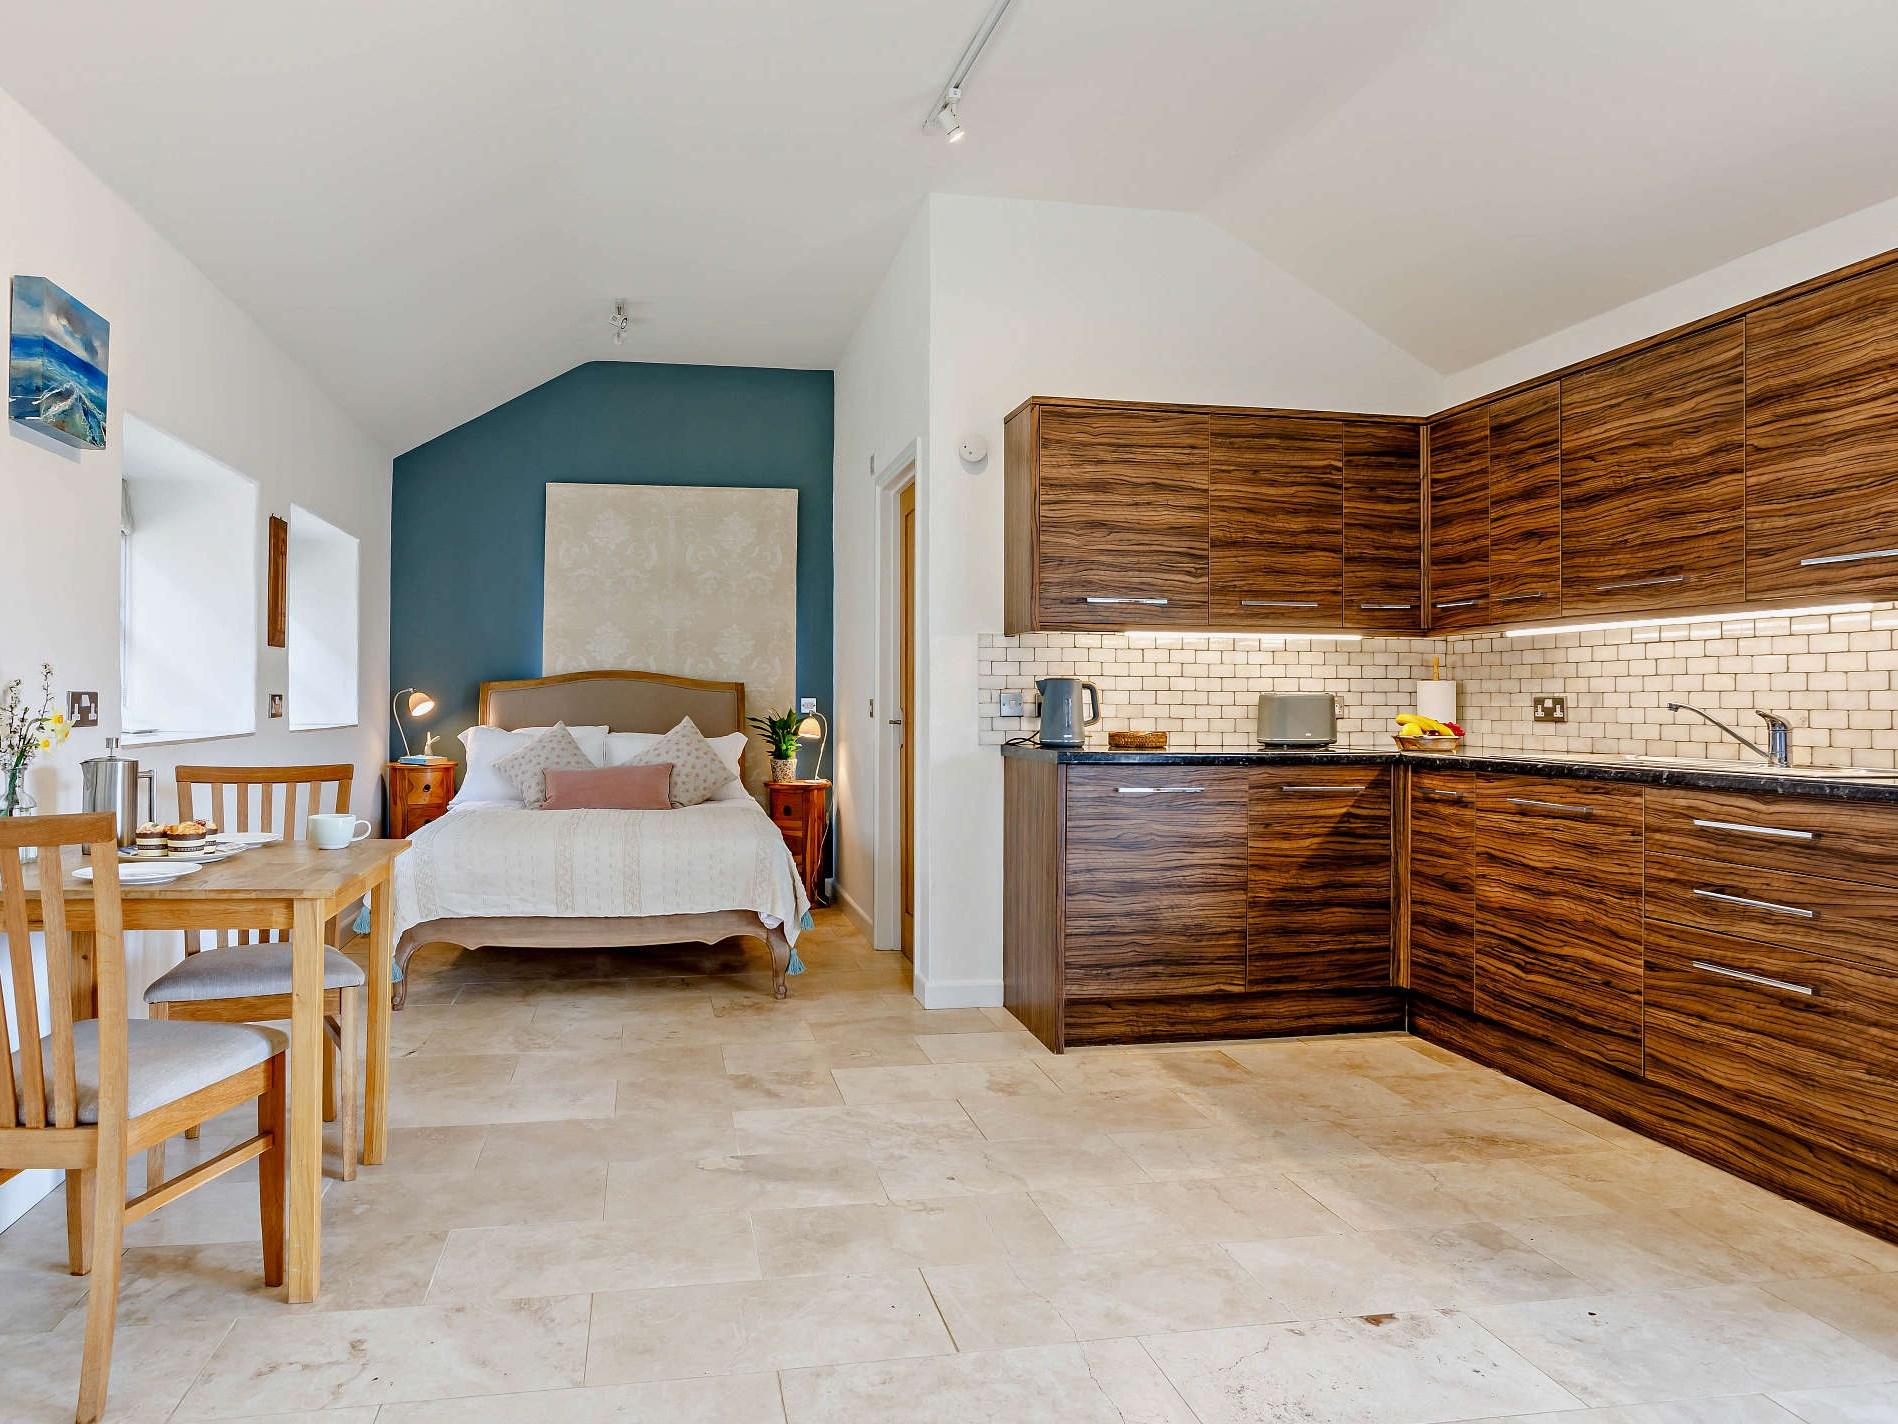 1 Bedroom Cottage in Cullompton, Devon